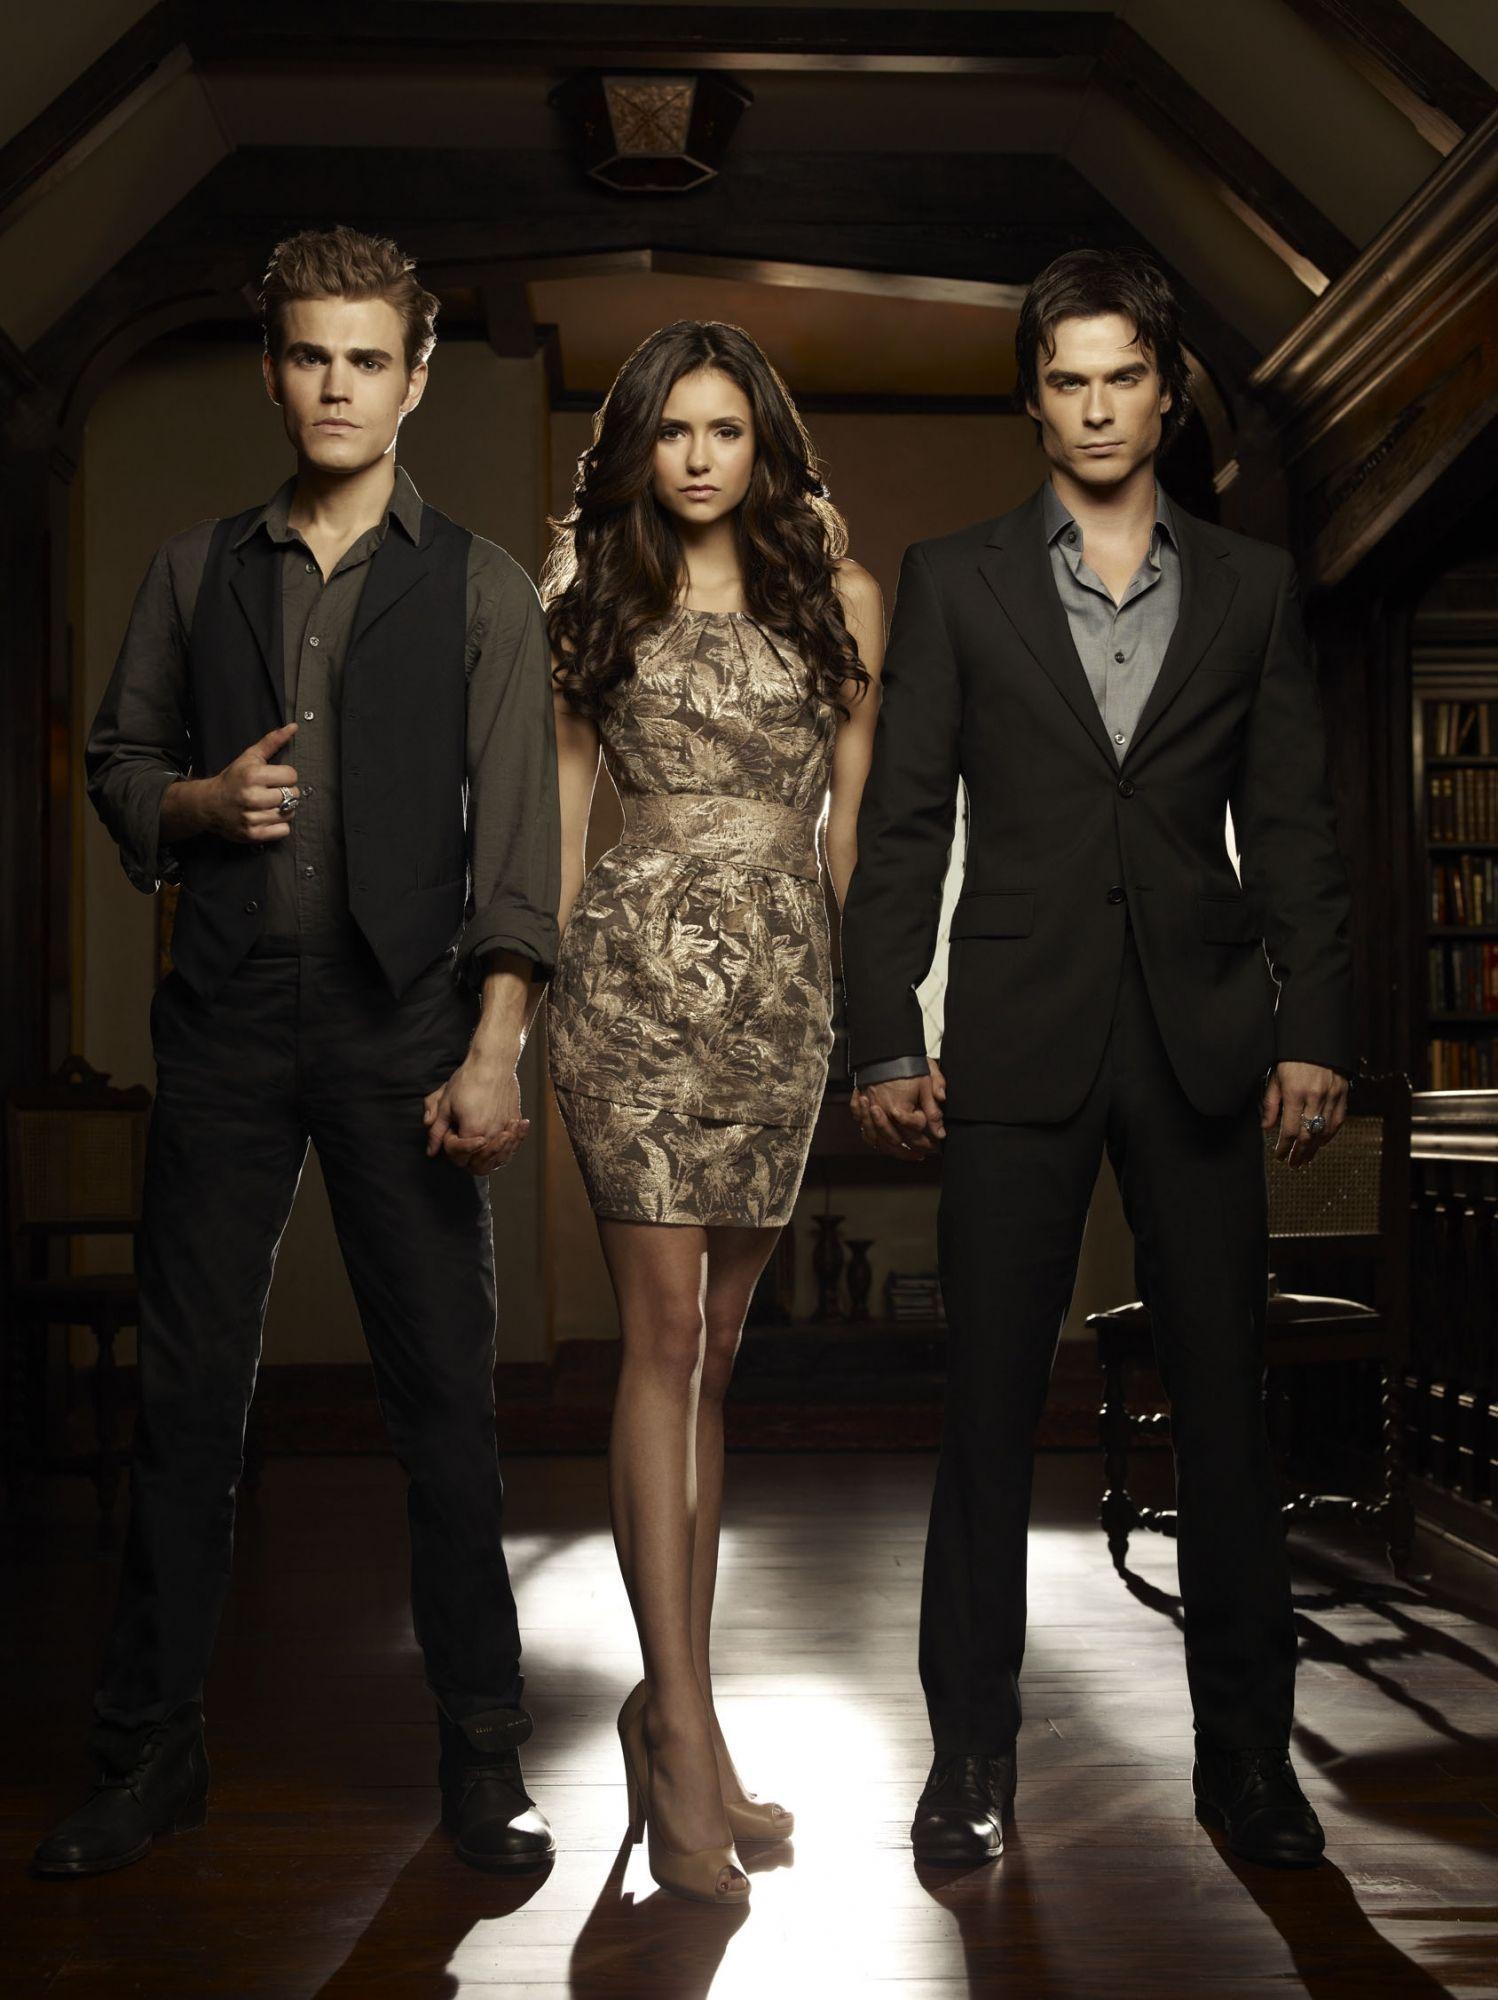 Stefan,Damon,Elena Vampire Diaries